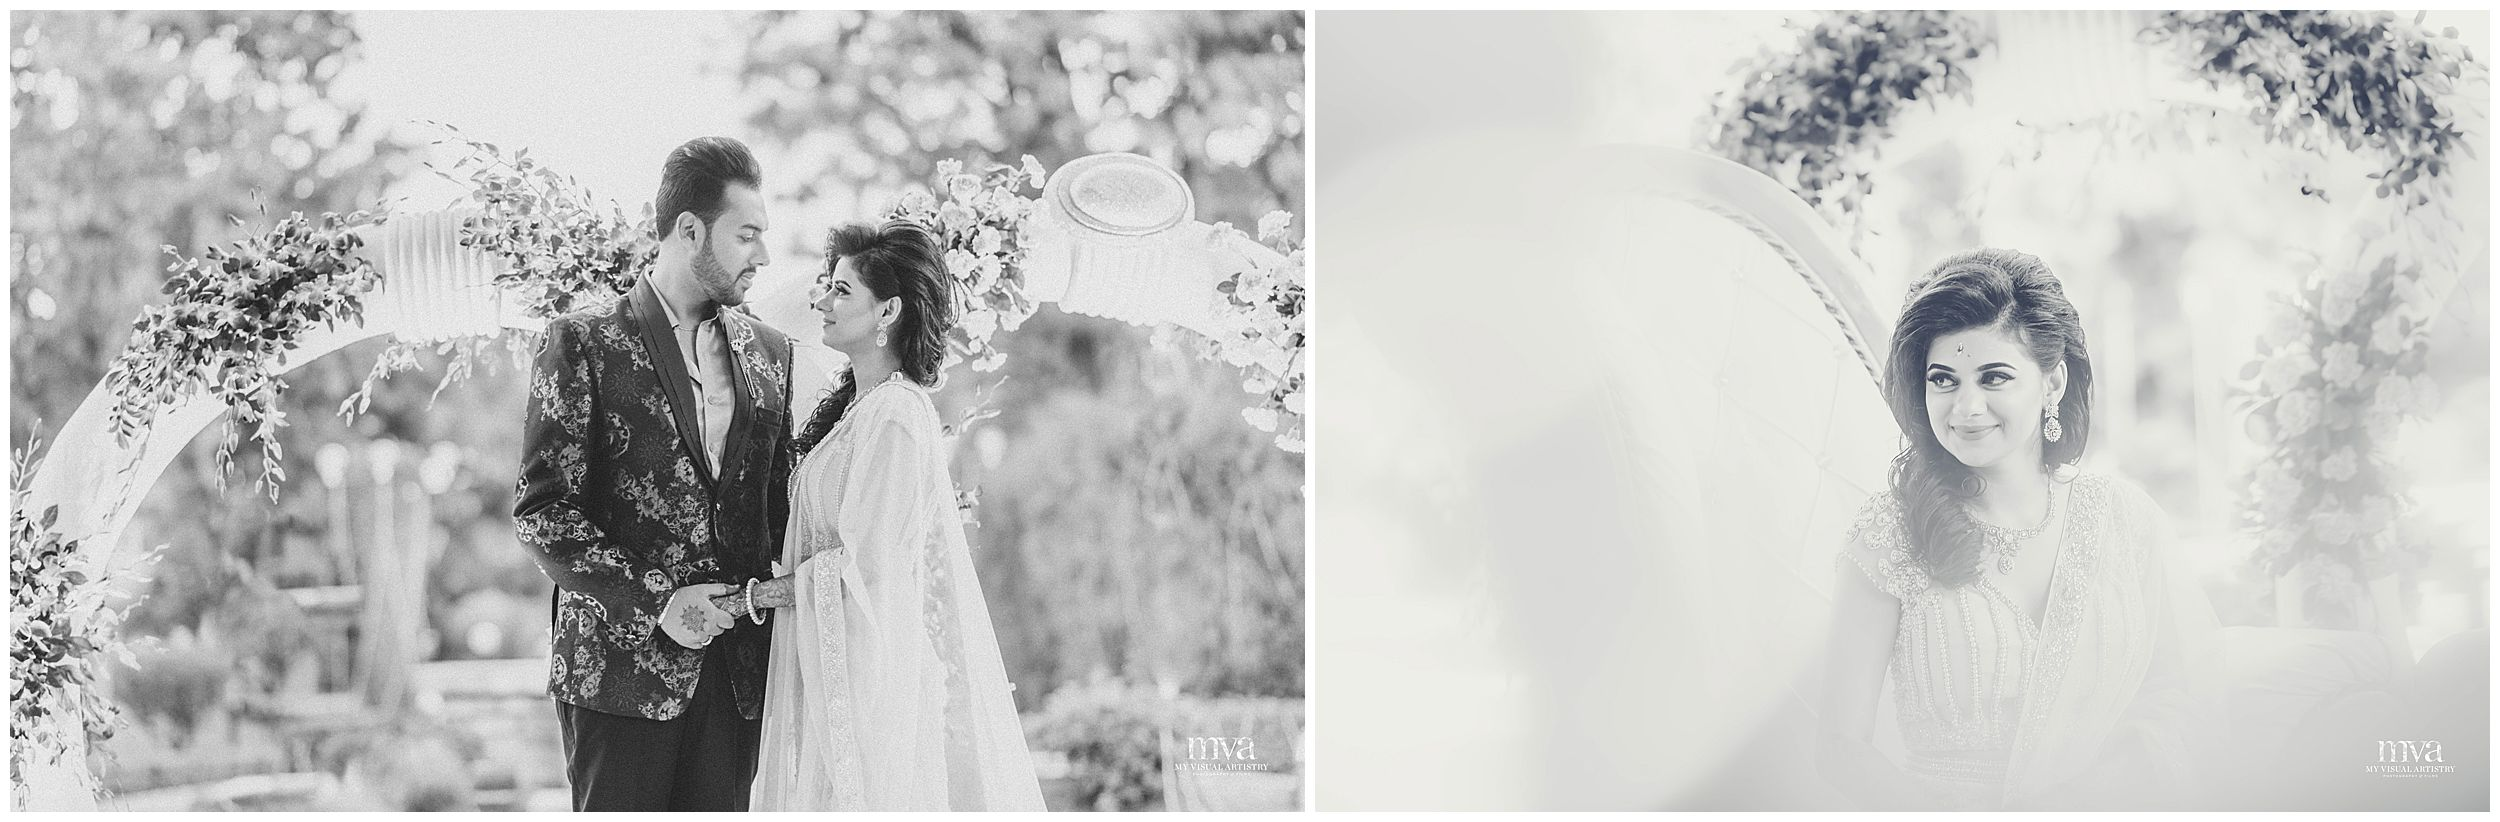 SONAAL_AMI_MYVISUALARTISTRY_WEDDING_PHOTOGRAPHY_MVA_NEPAL_KATHMANDU_SOALTEE12.jpg